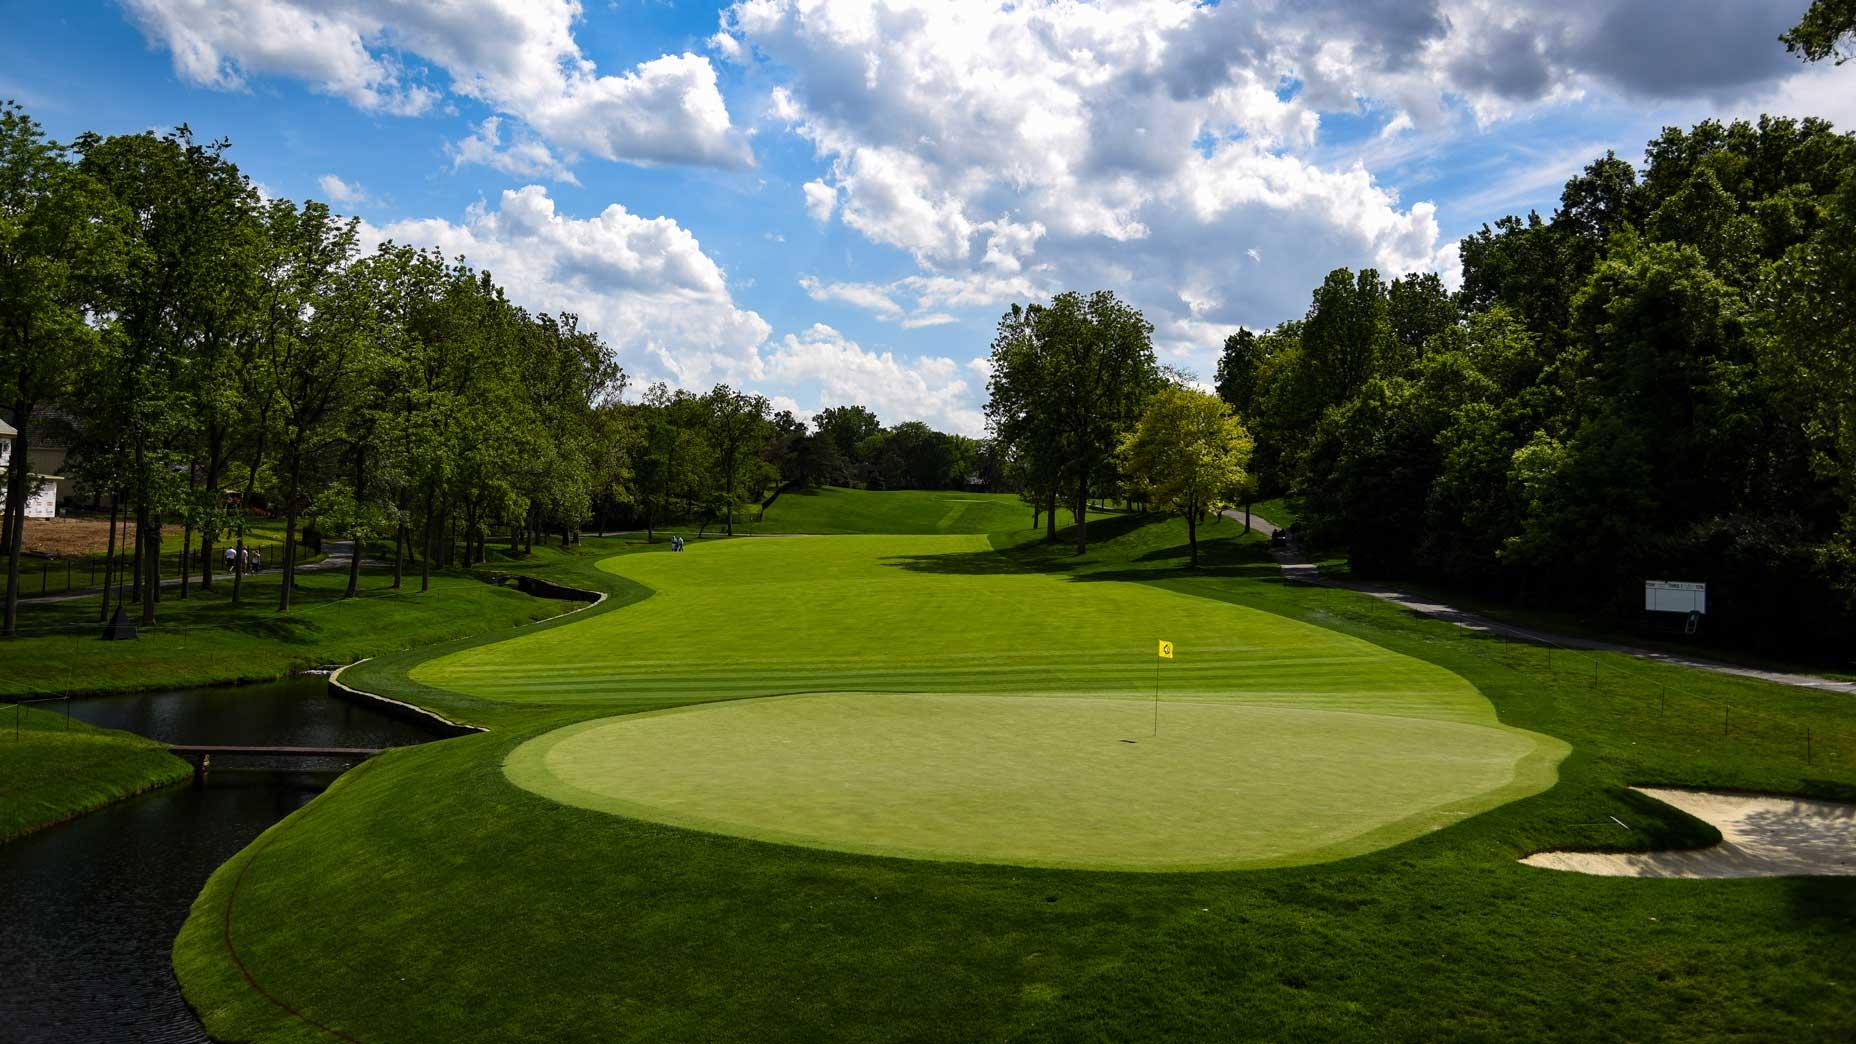 The par-4 2nd hole at Muirfield Village Golf Club in 2017.